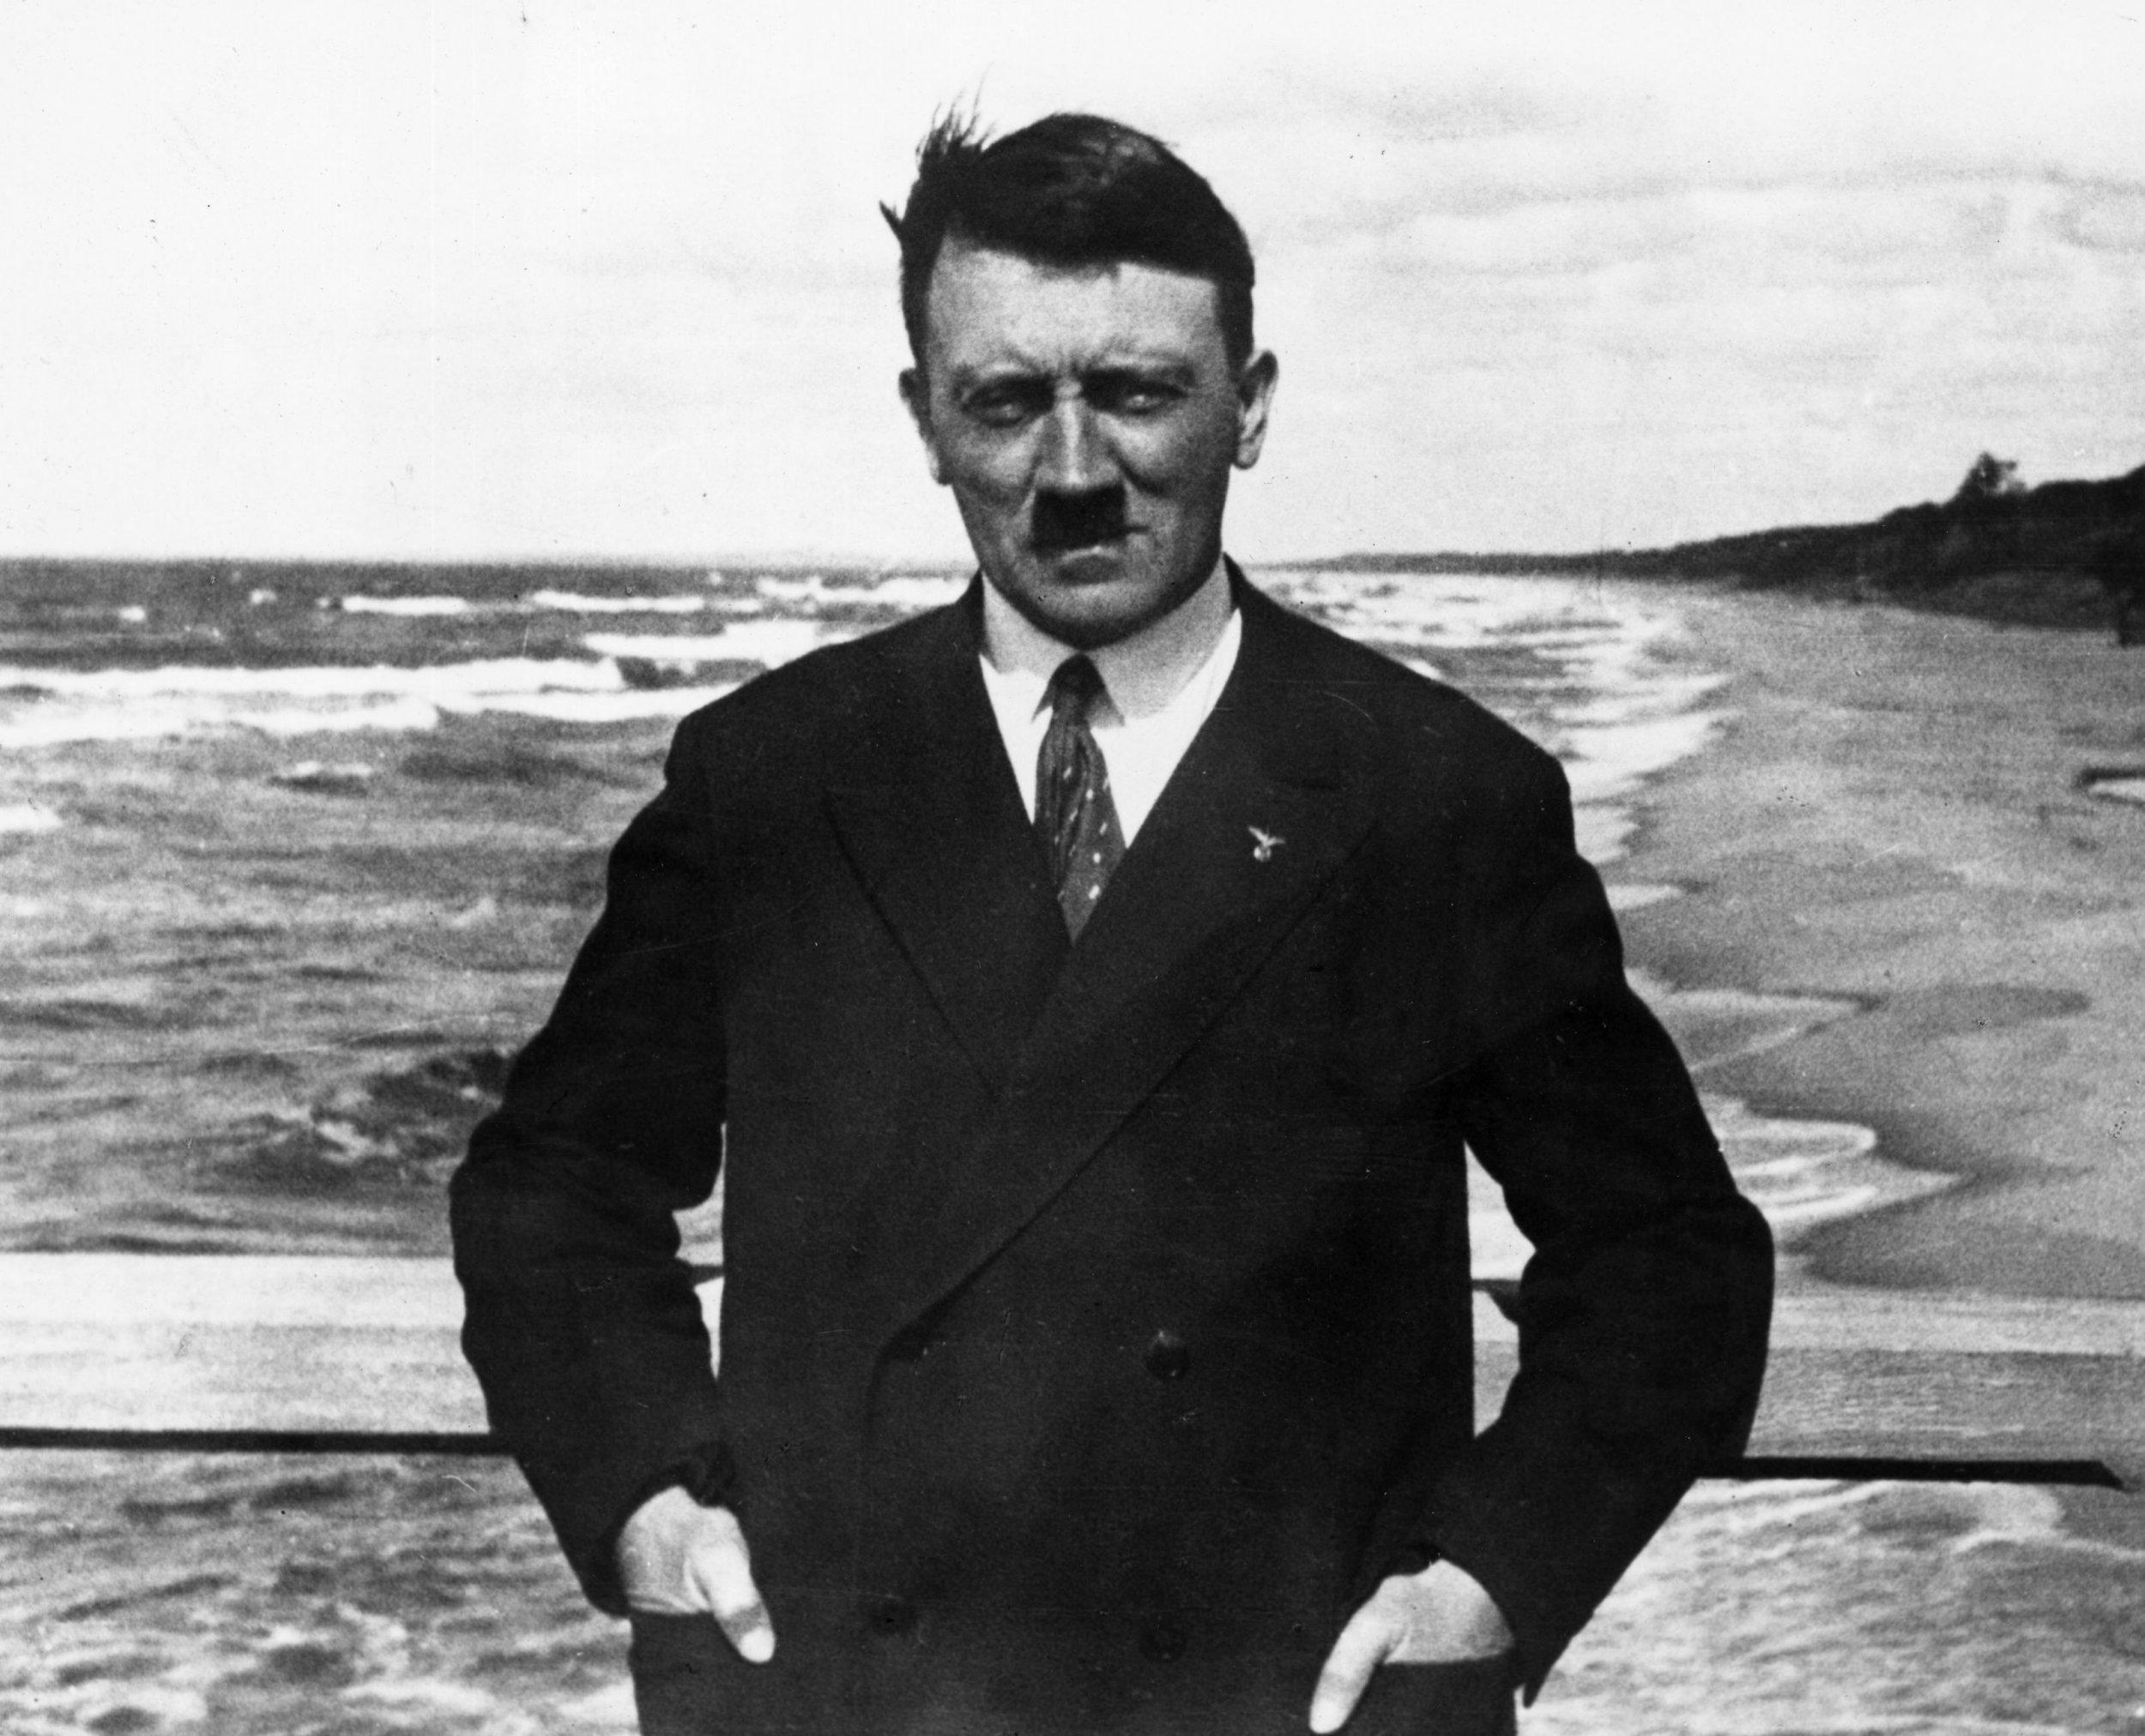 Adolf Hitler, Paintings, Nazi, Artwork, Auction, Nuremberg